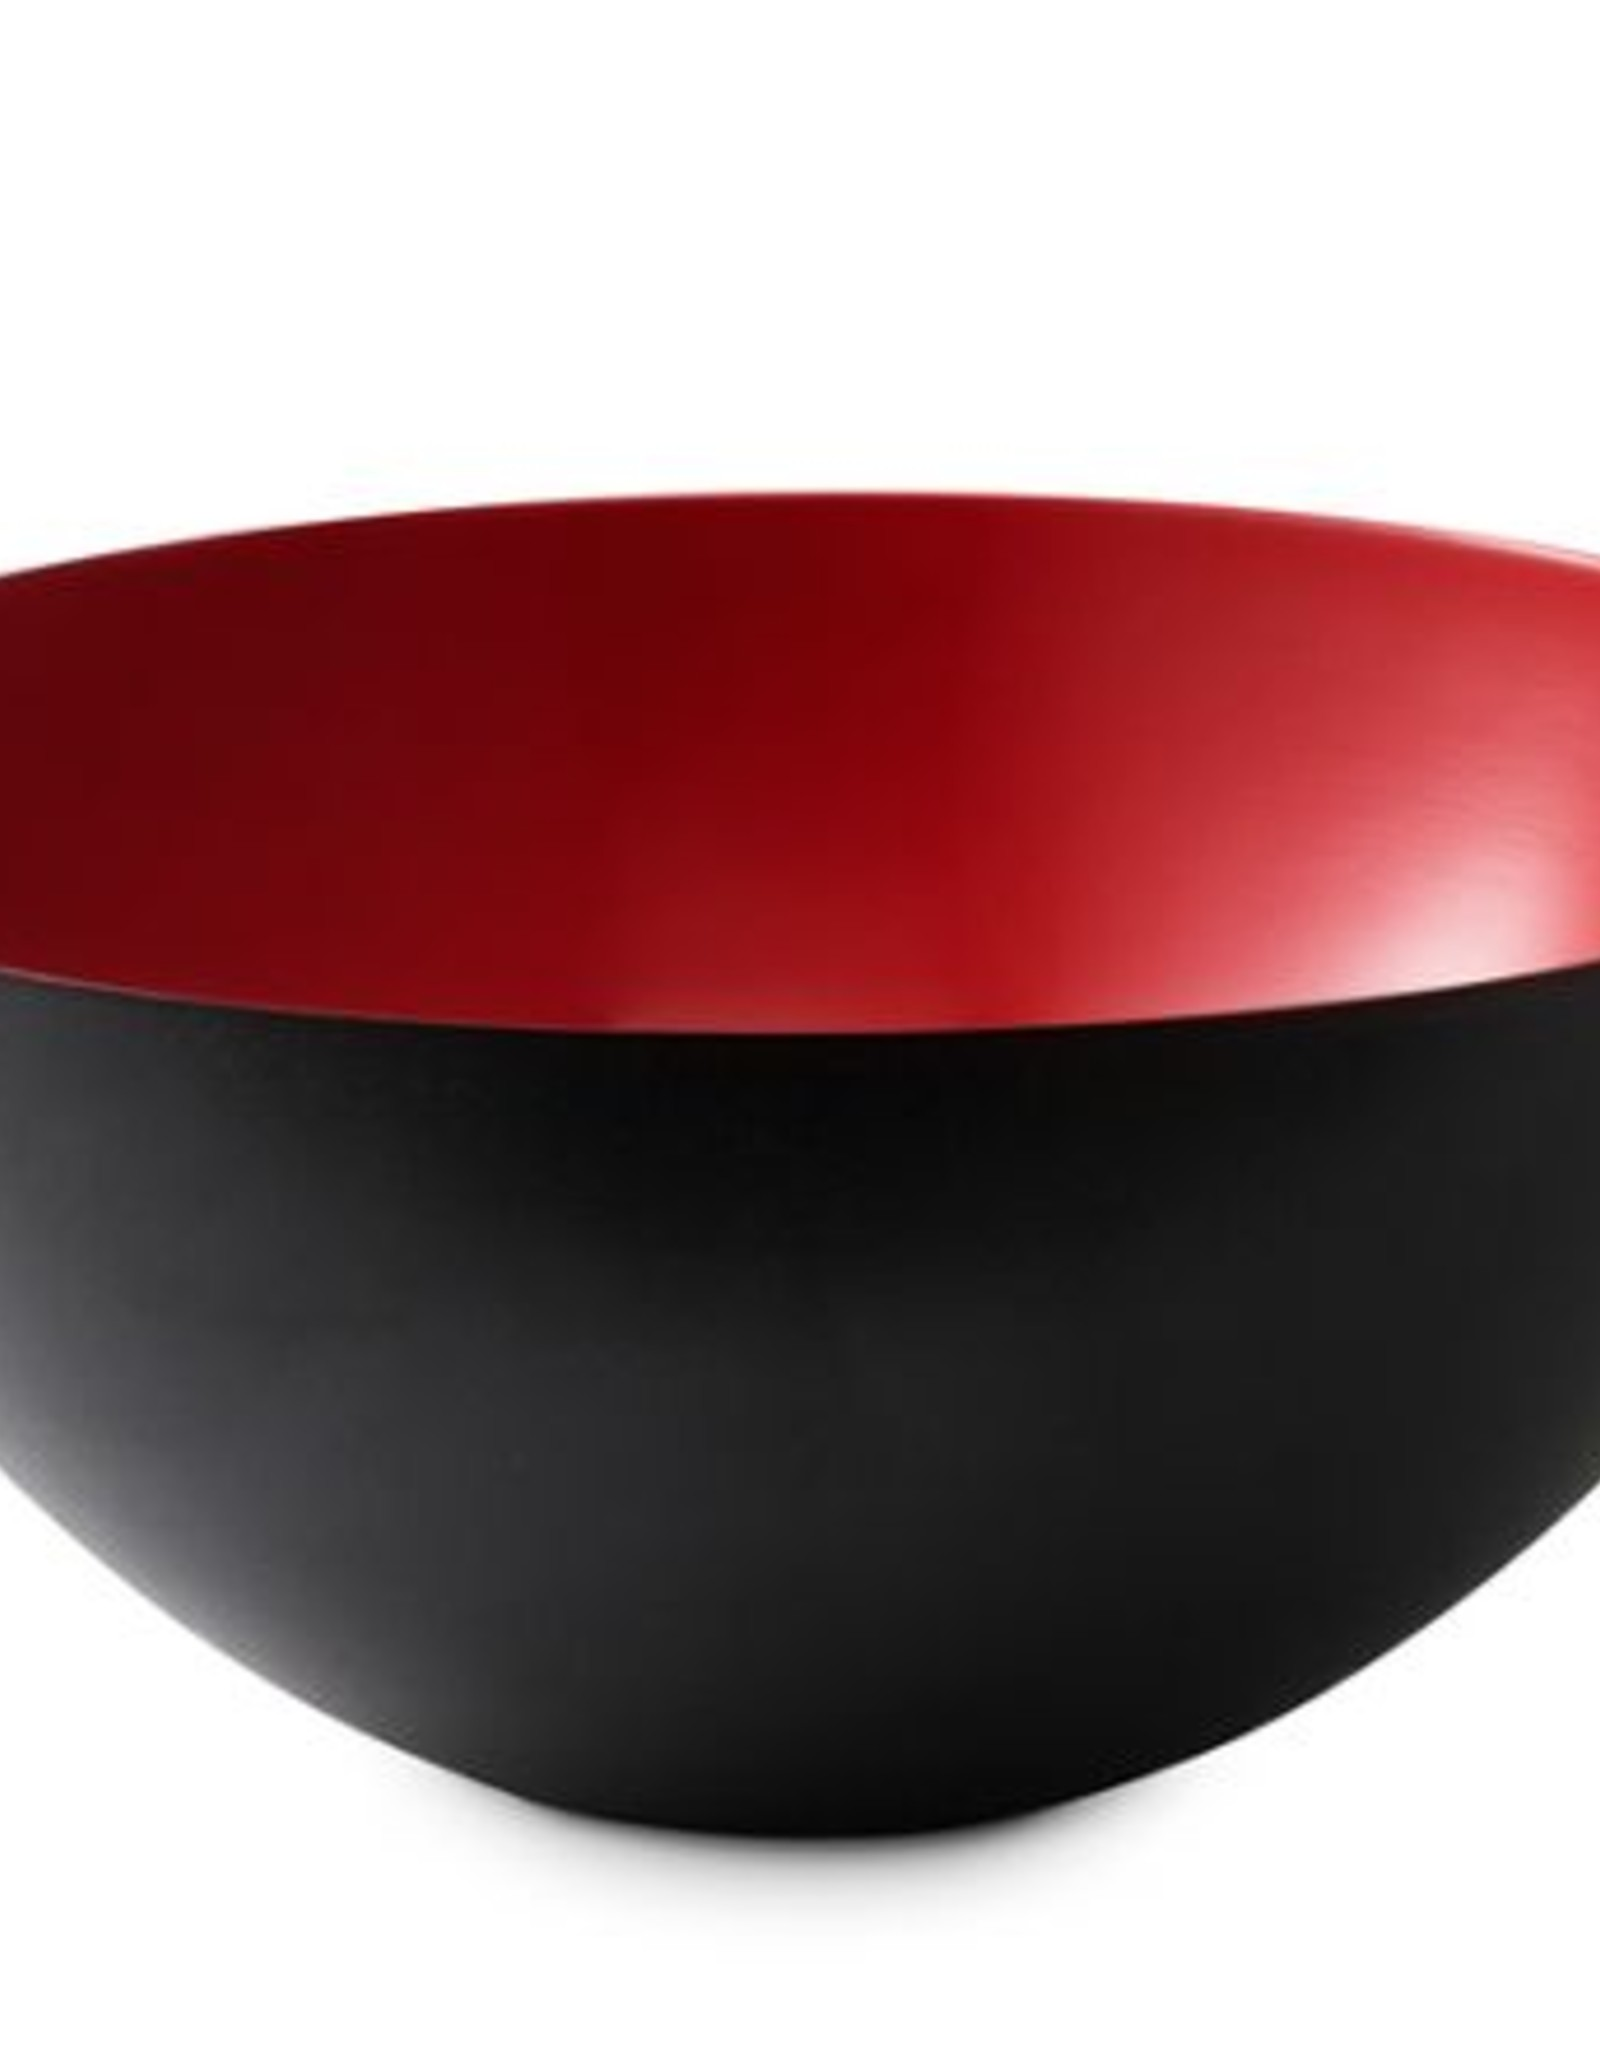 Normann Copenhagen Krenit red Medium